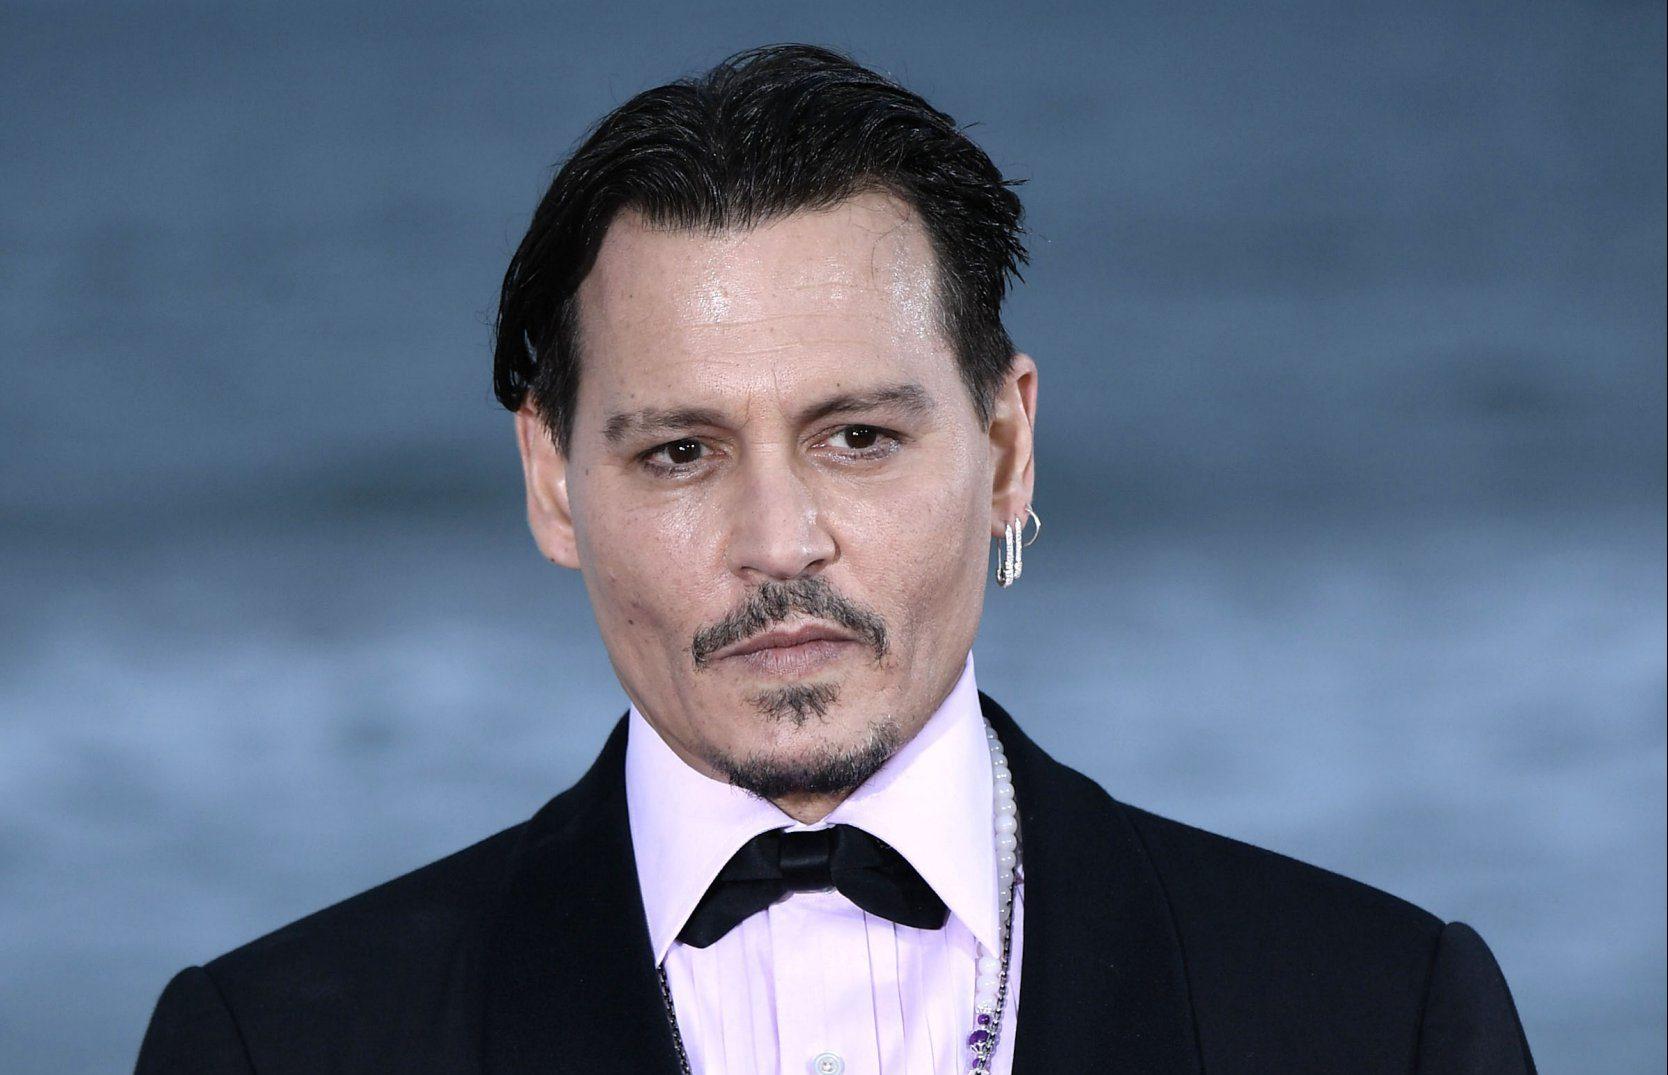 Johnny Depp at the Hainan International Film Festival